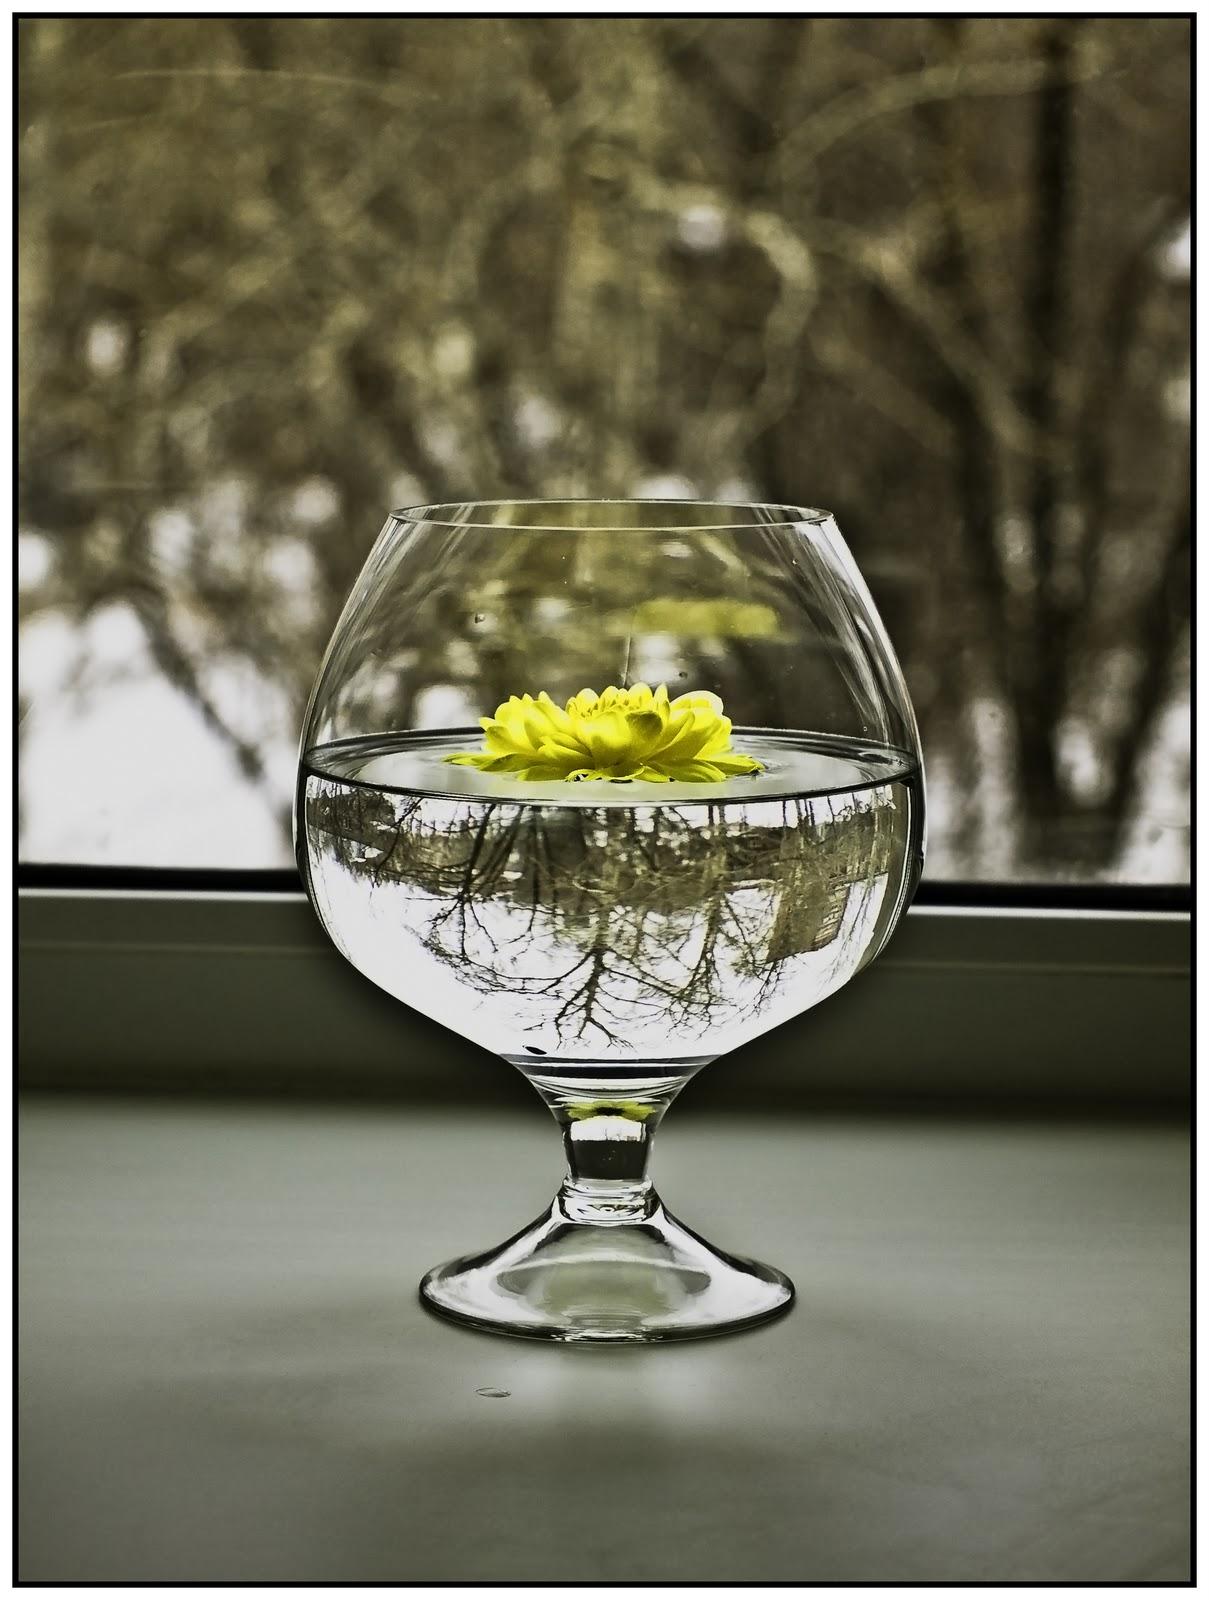 Фото цветы в стакане стакан